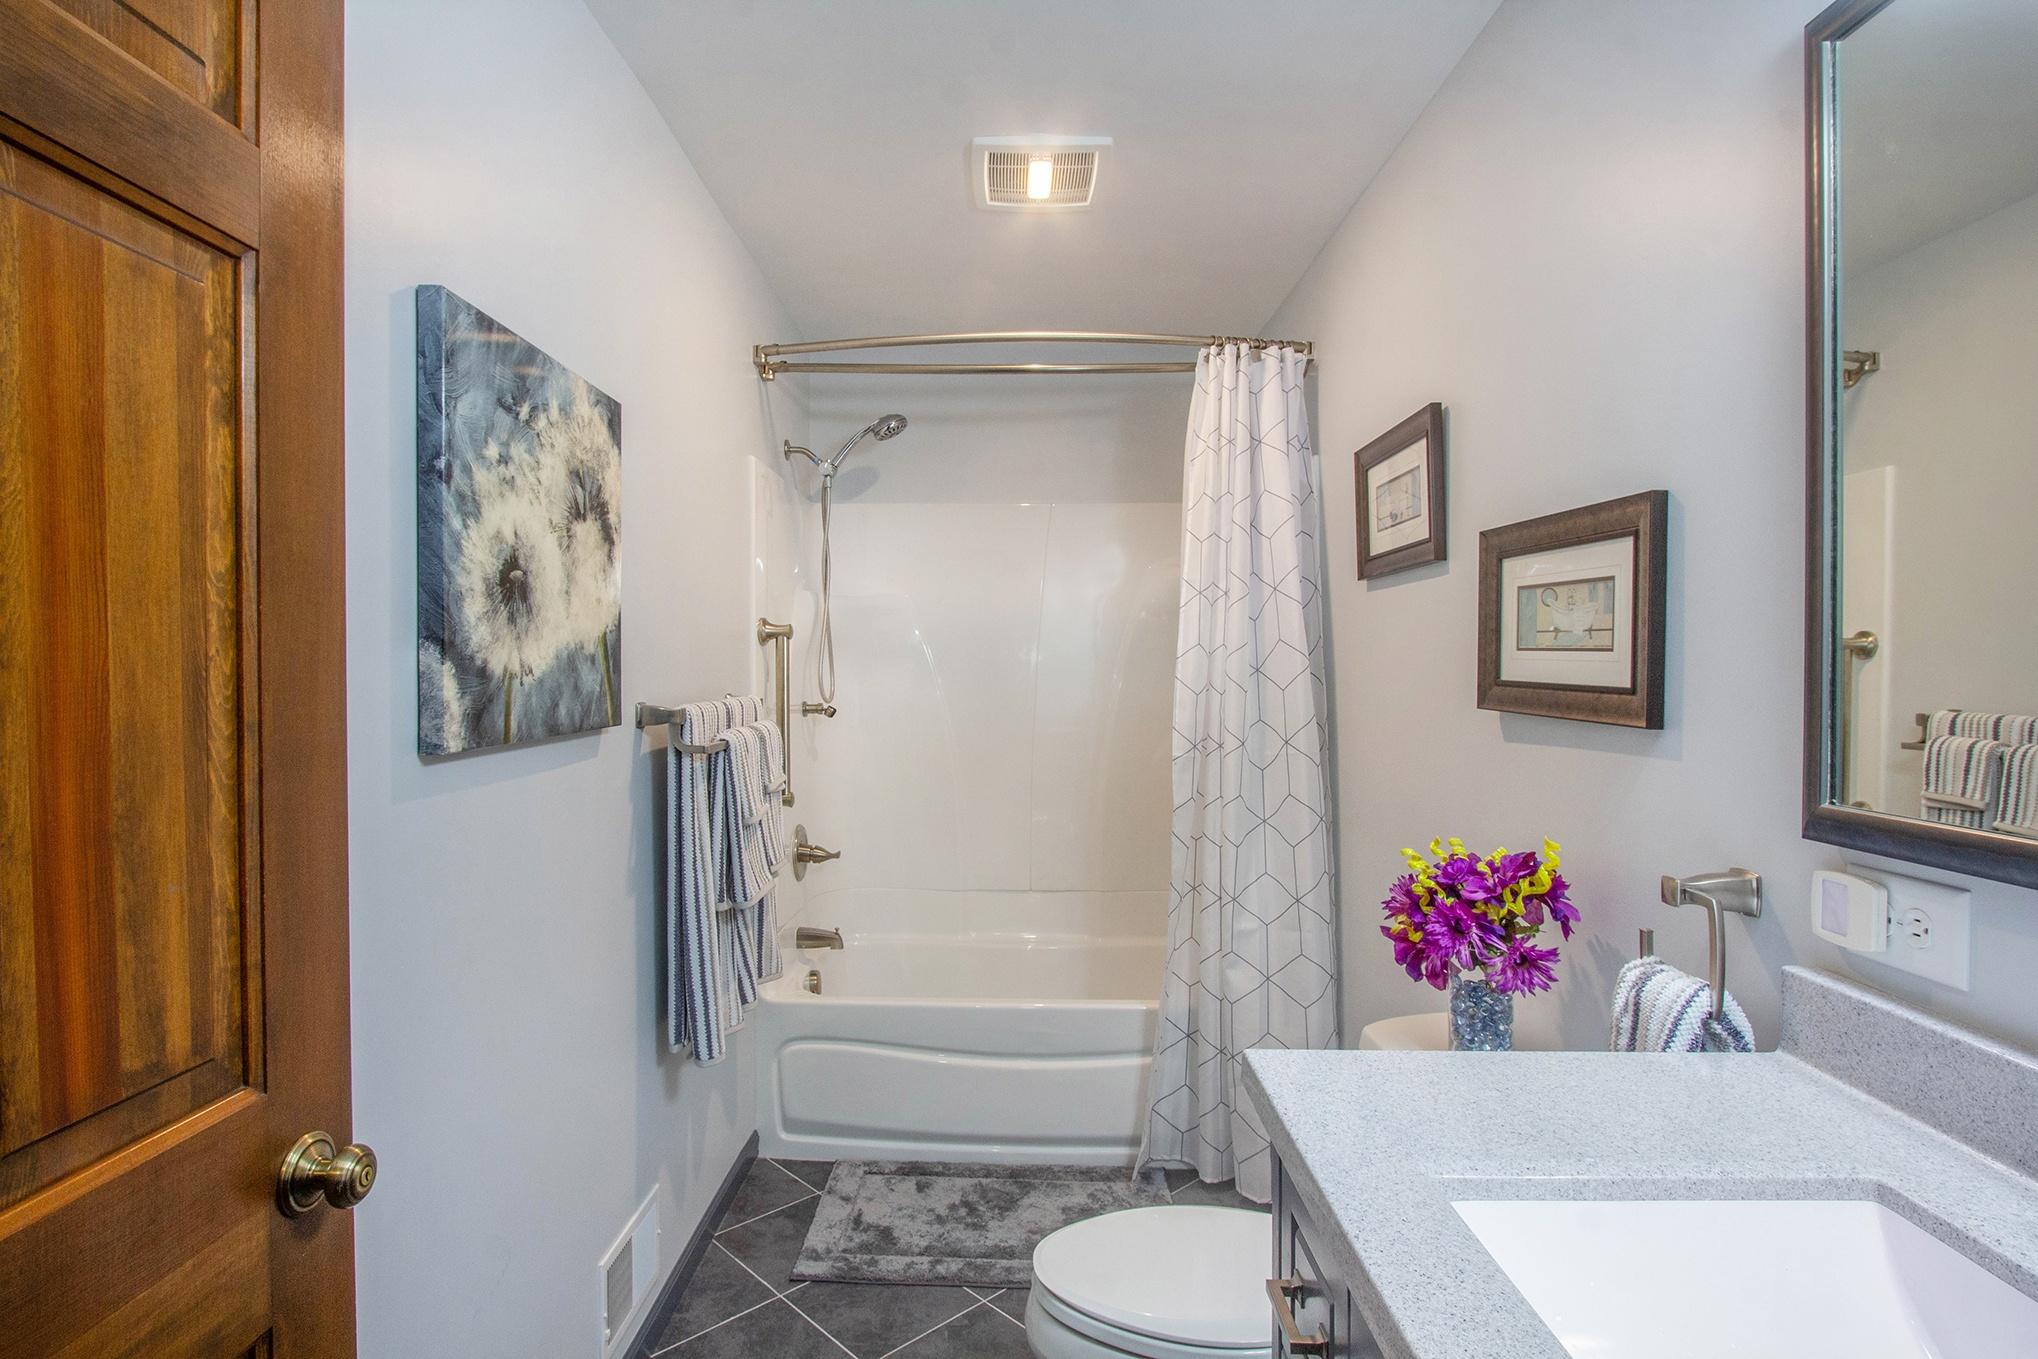 GroveBluff Bathroom and Shower